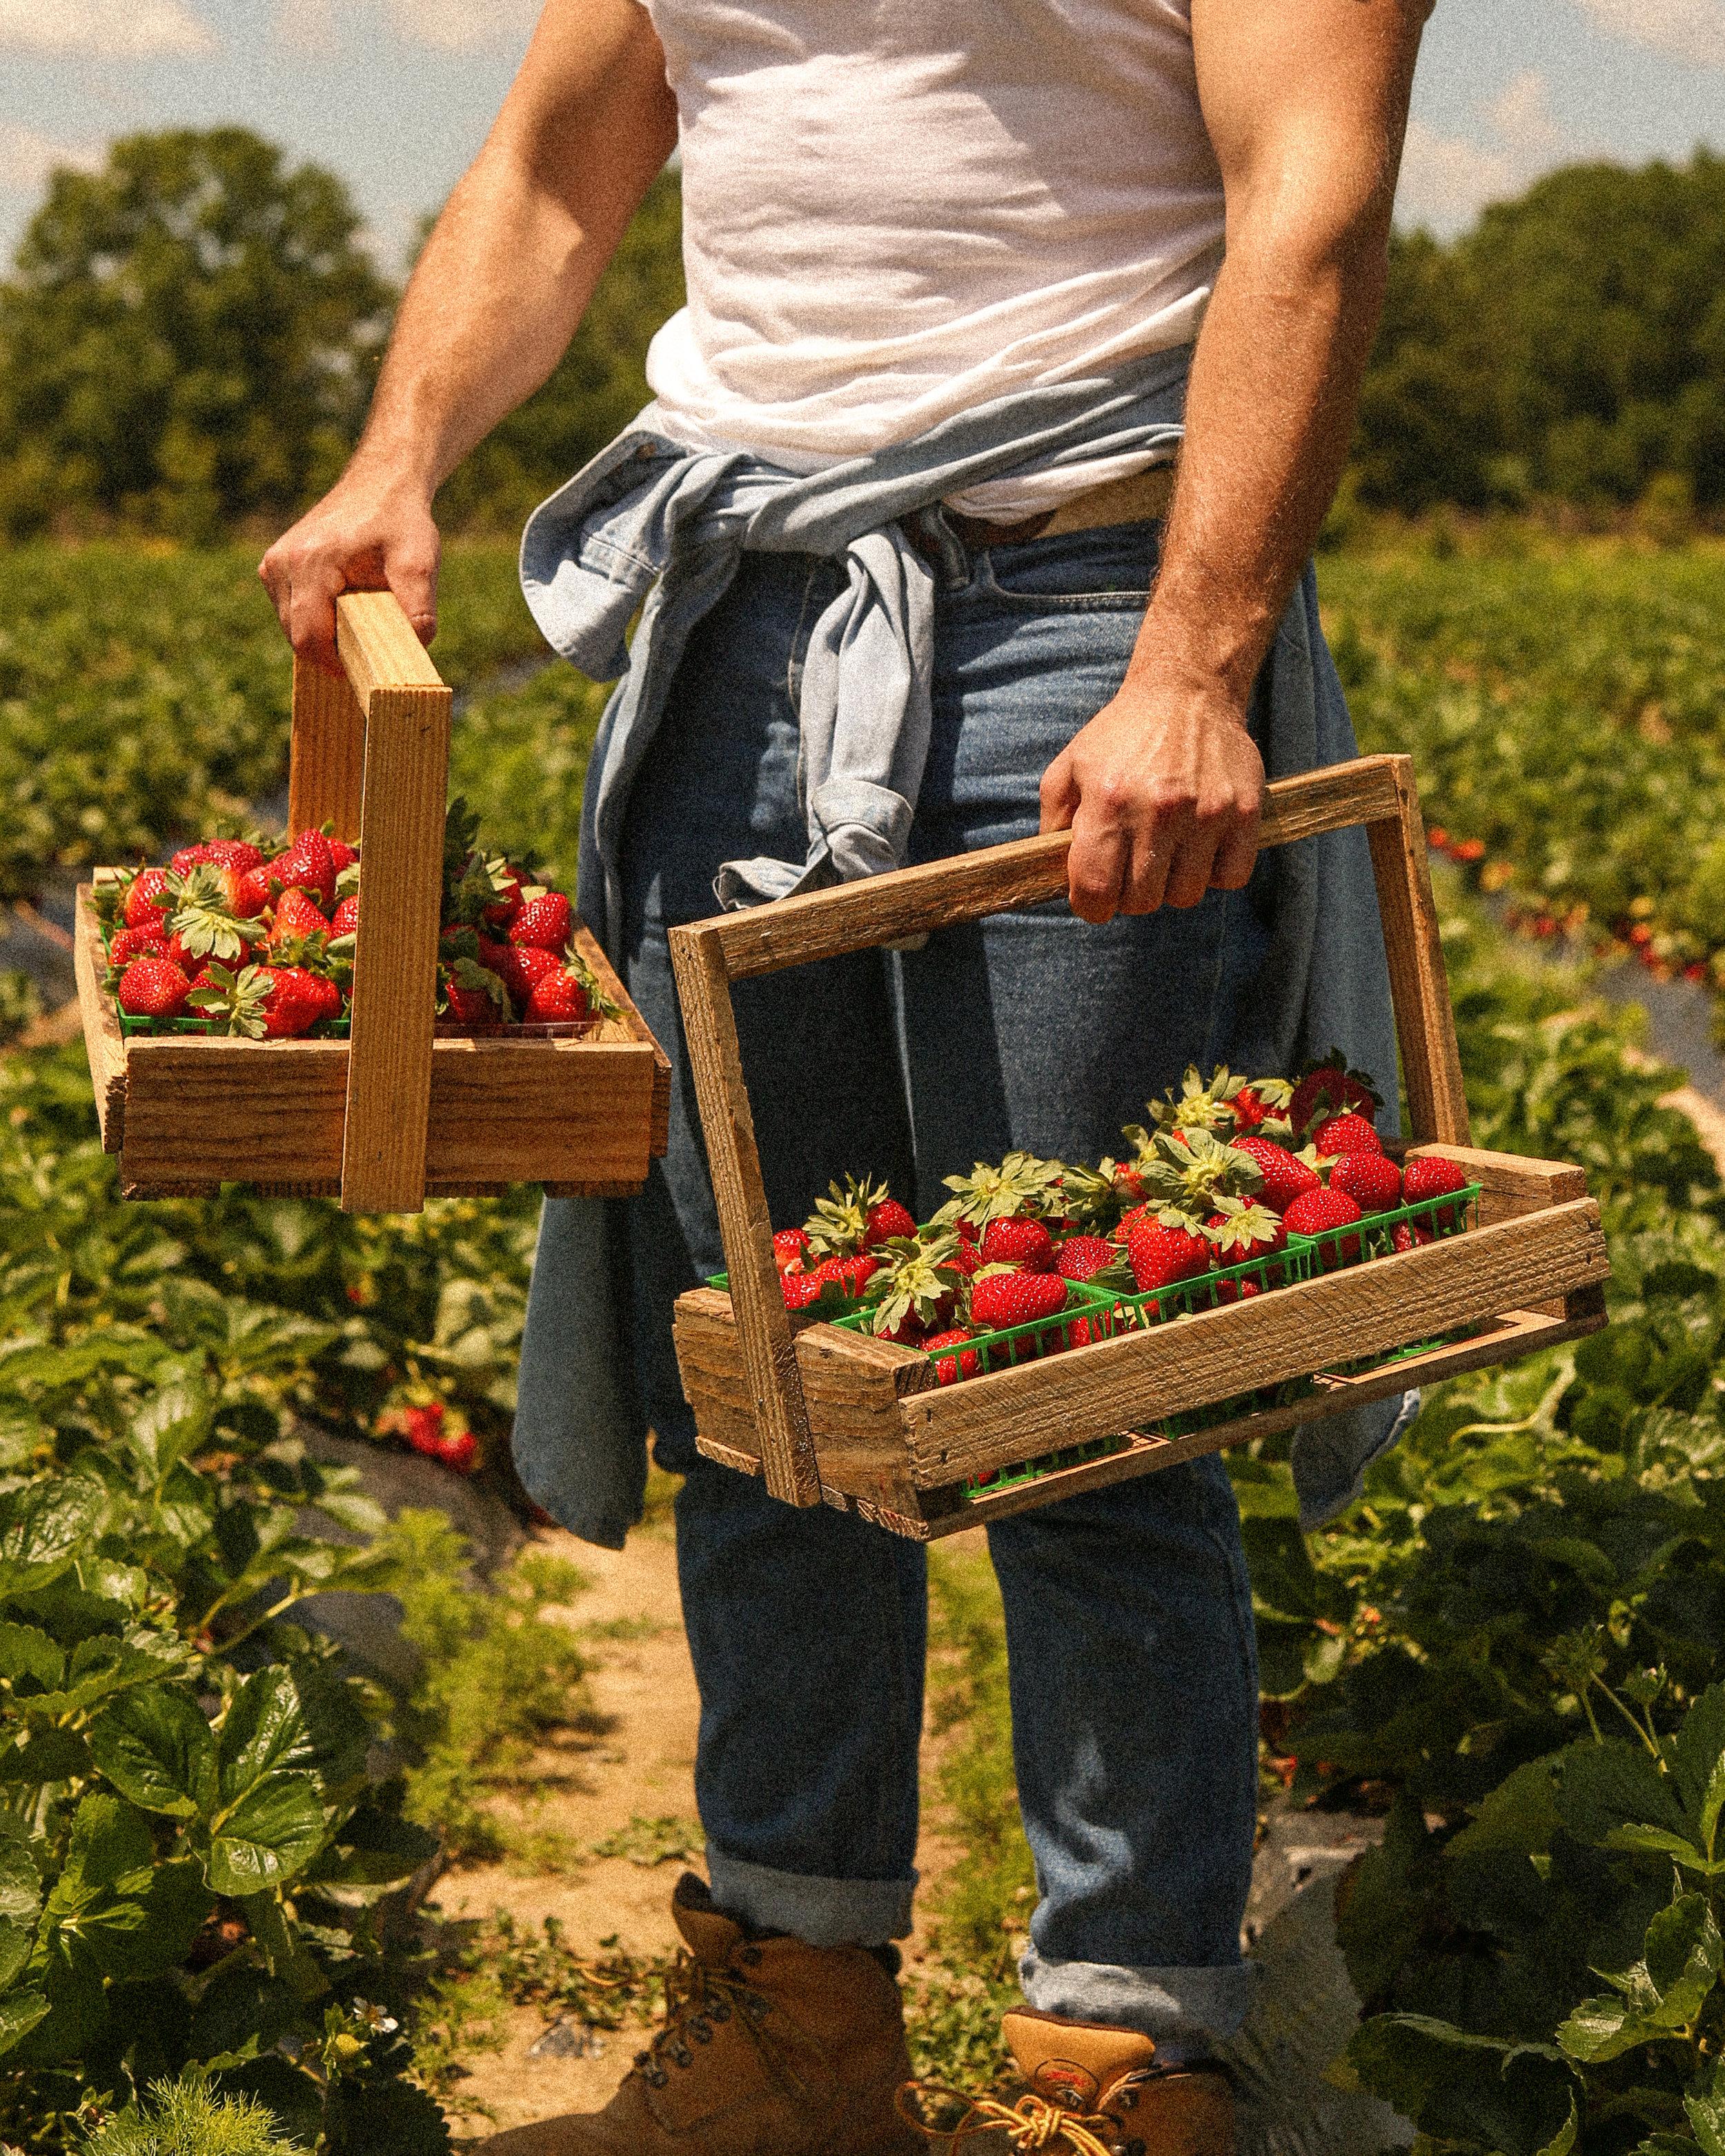 louisiana strawberry picking